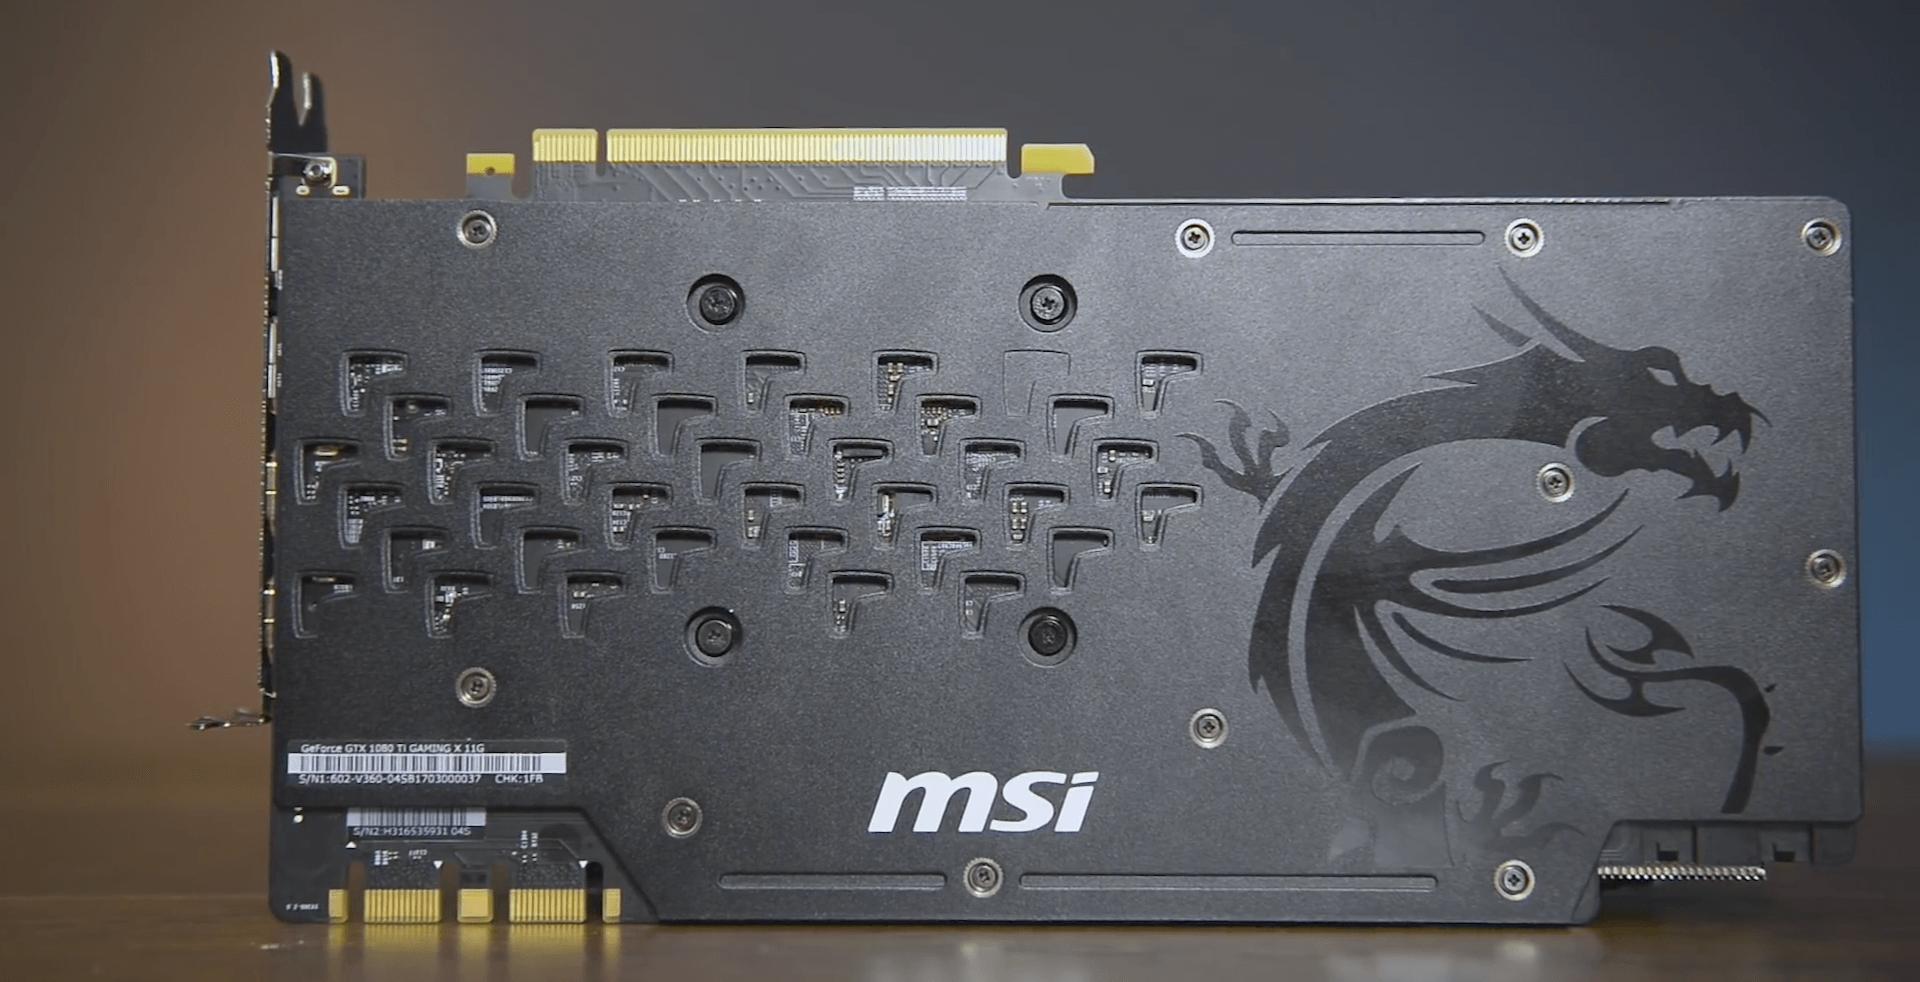 Особенности видеокарты msi gtx 1080 ti gaming x